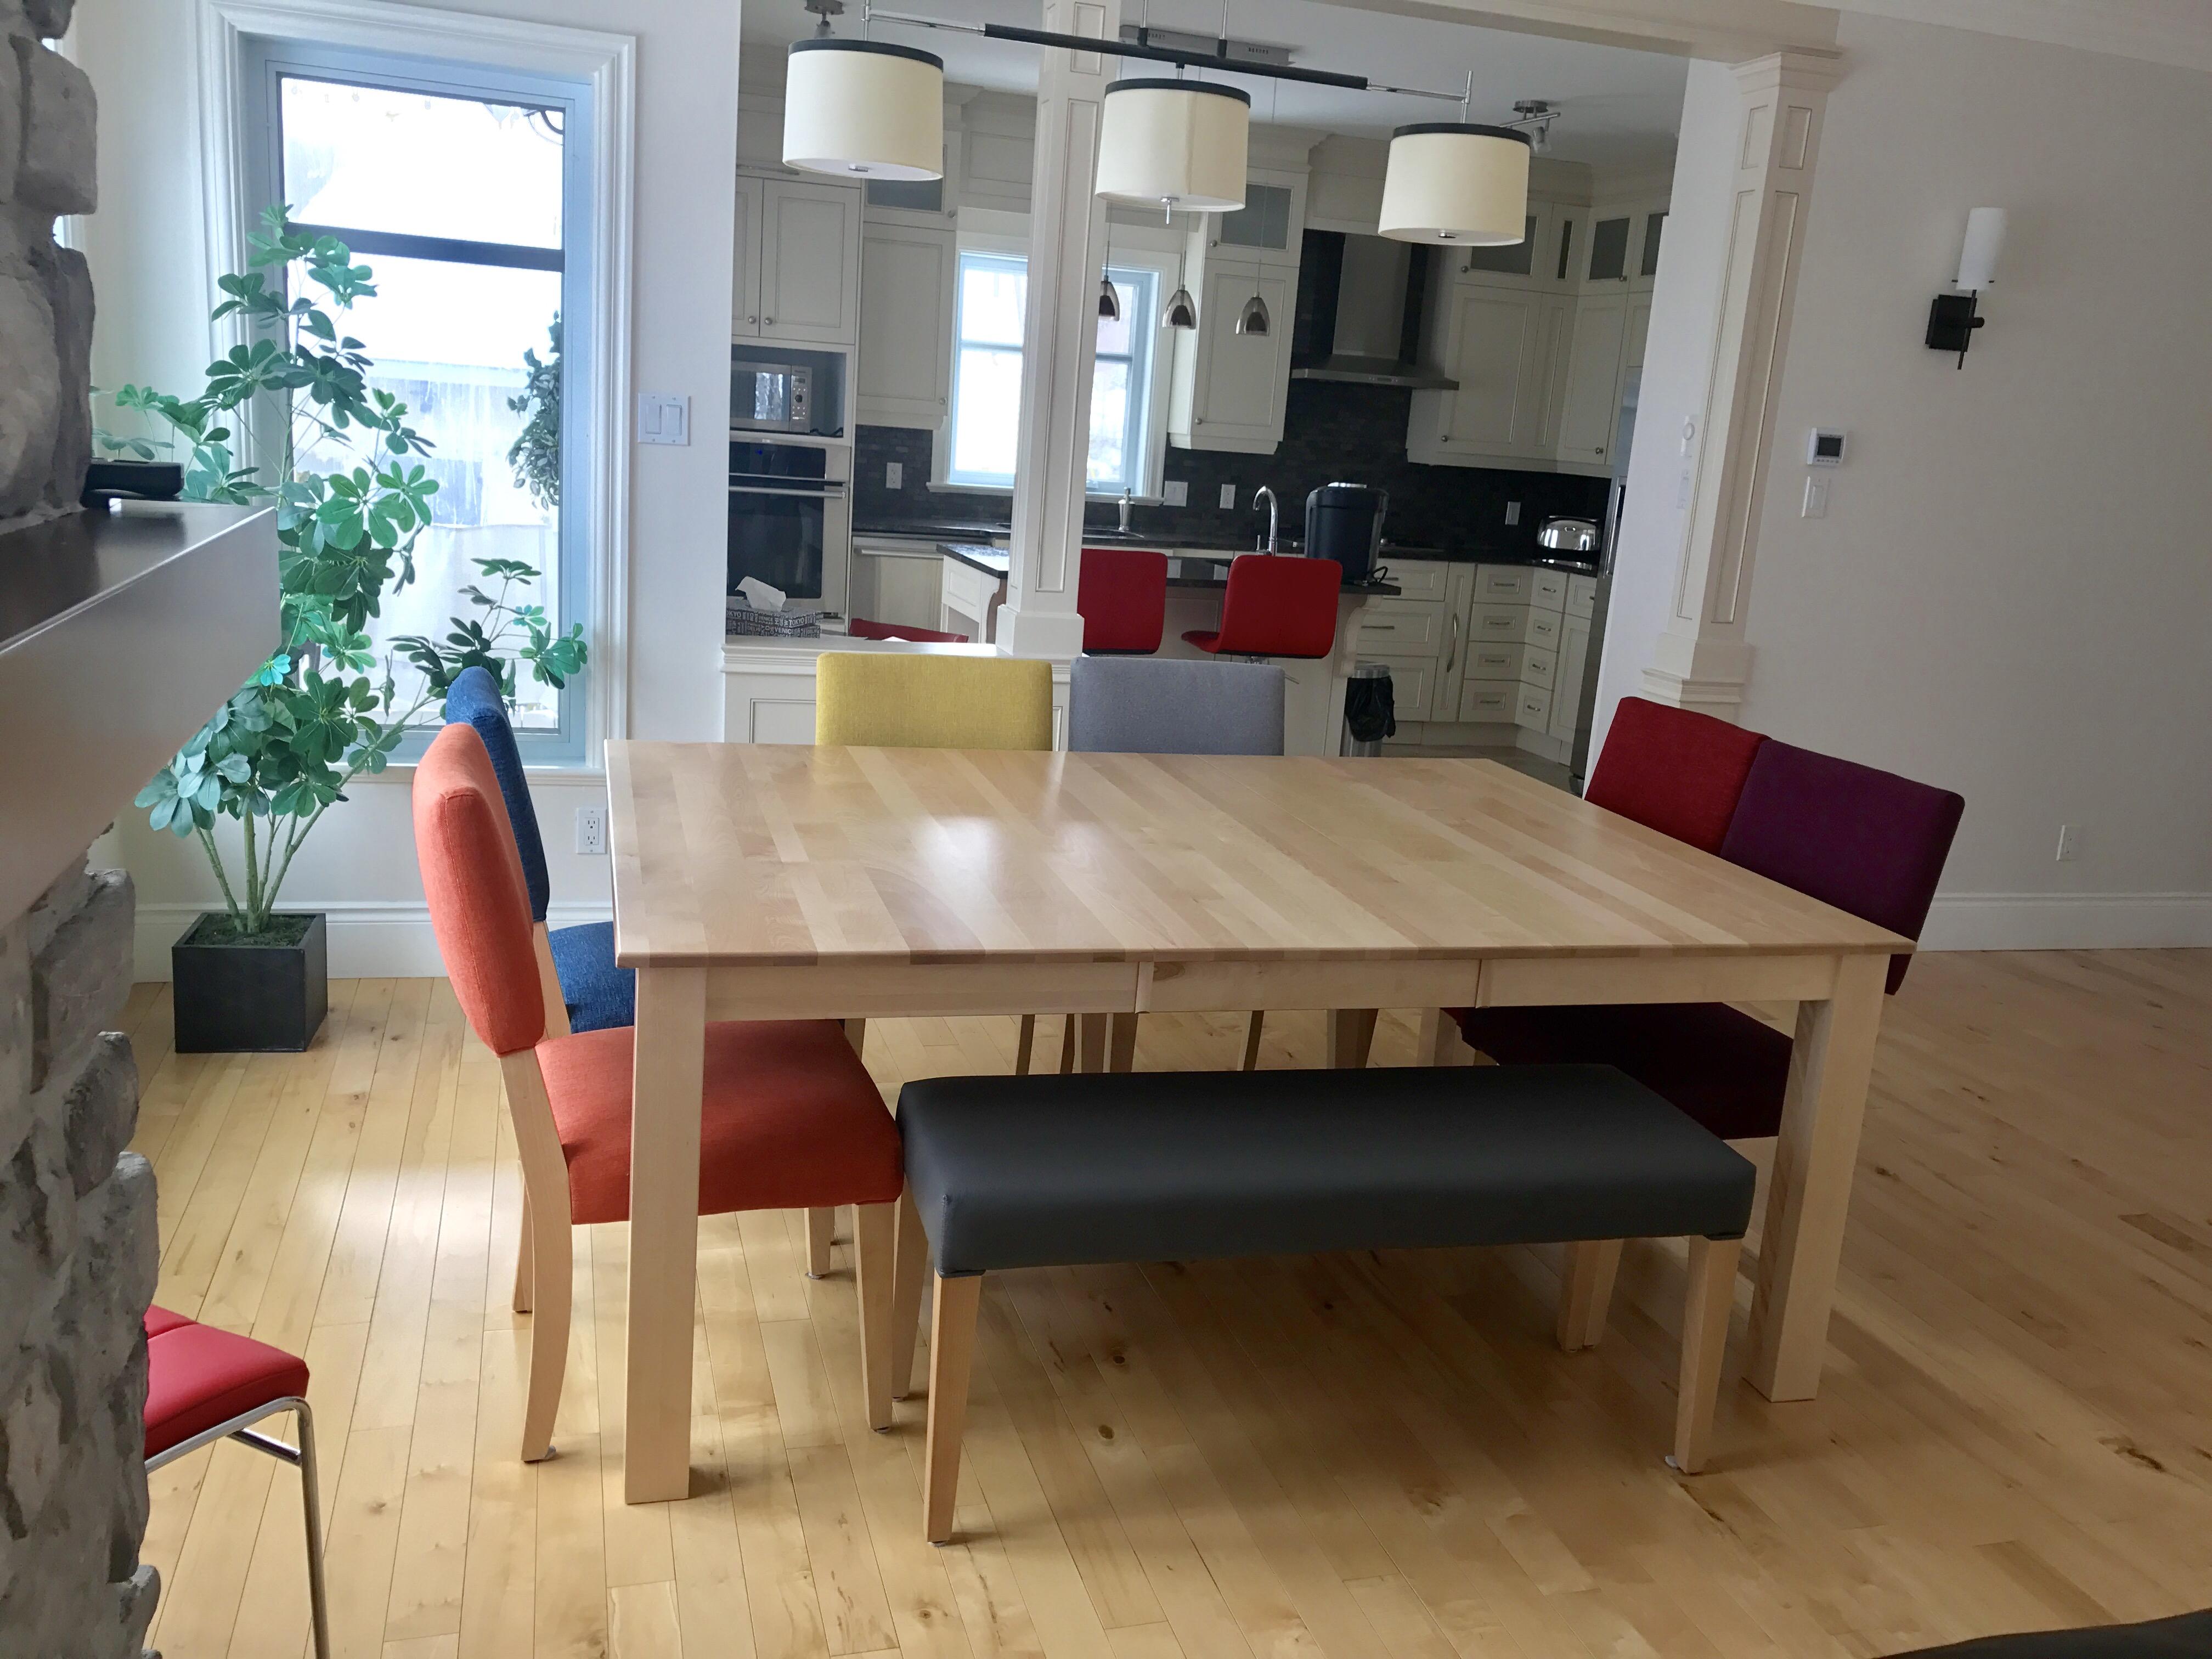 Table salle à manger 1